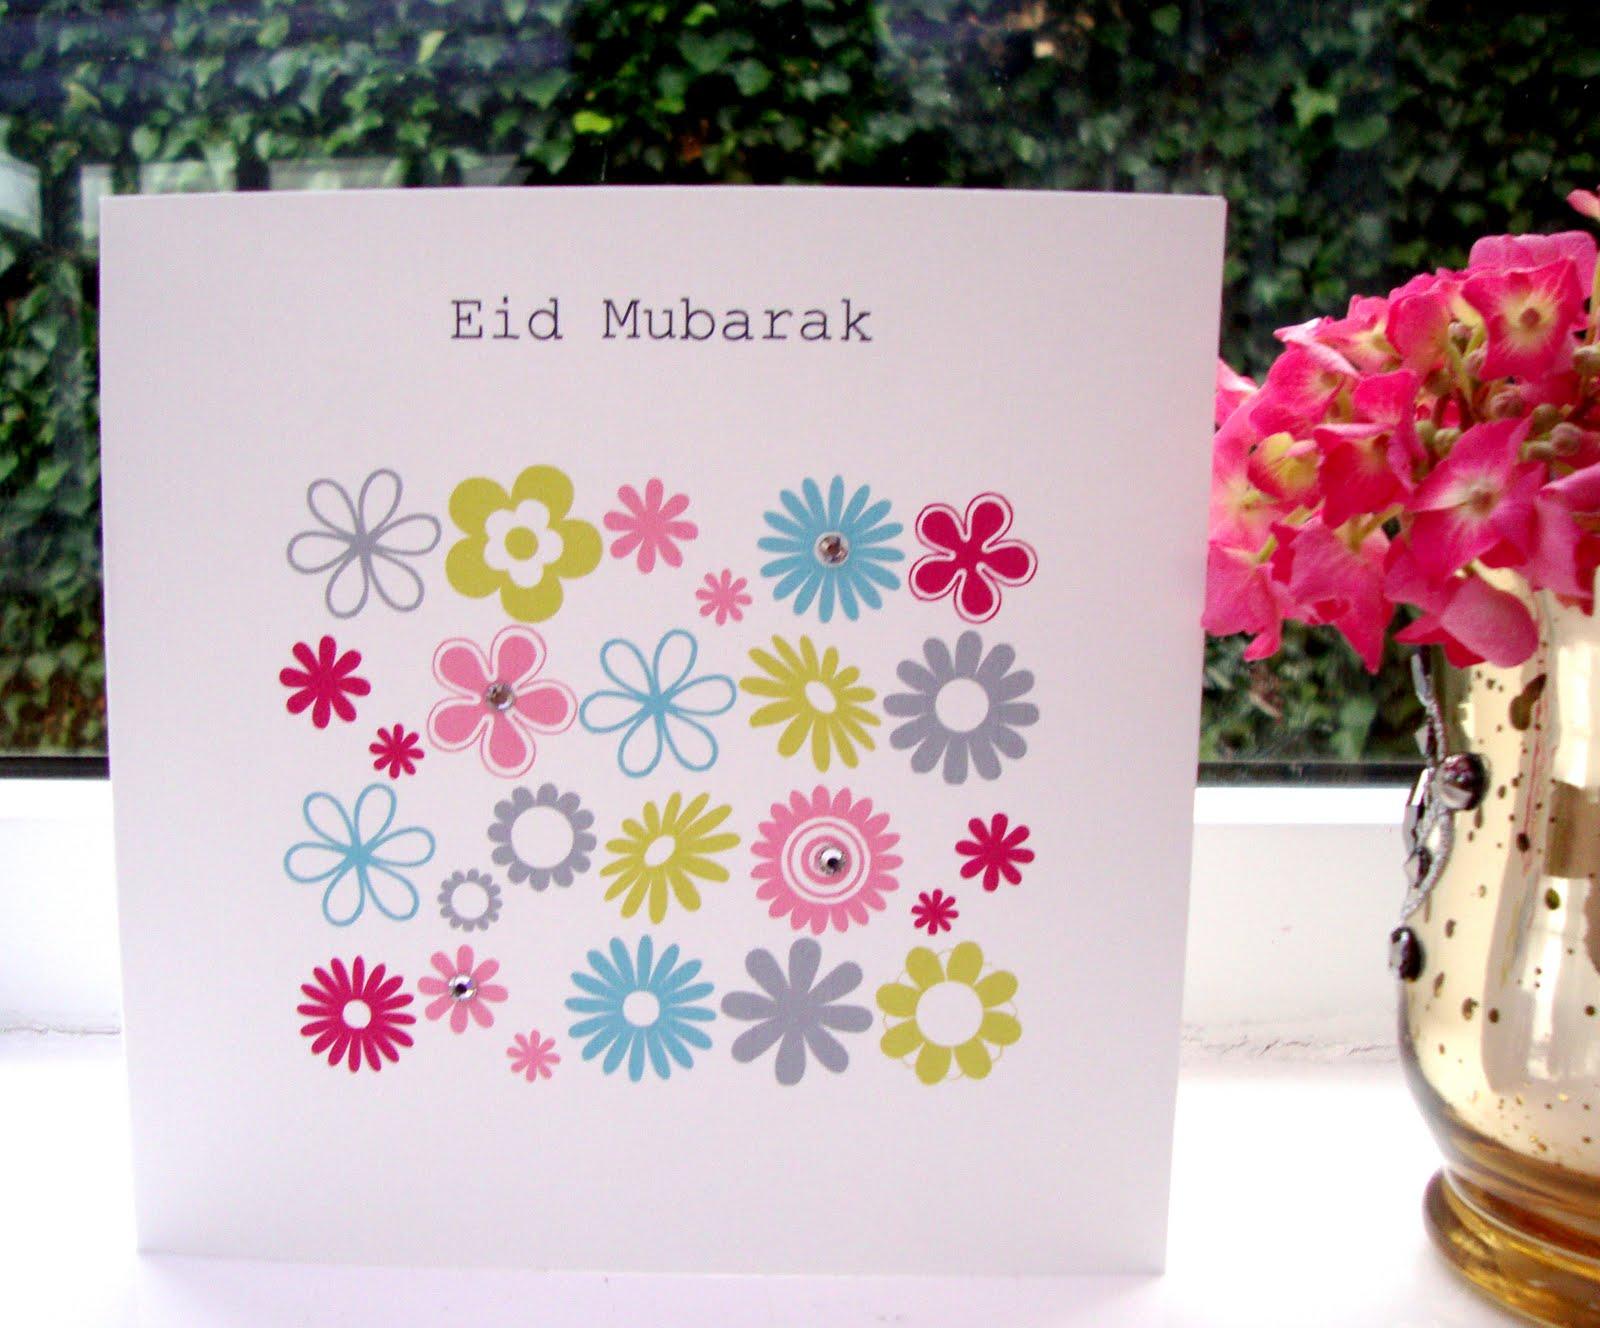 Eid Card Making Ideas Part - 47: Eid Card Designs